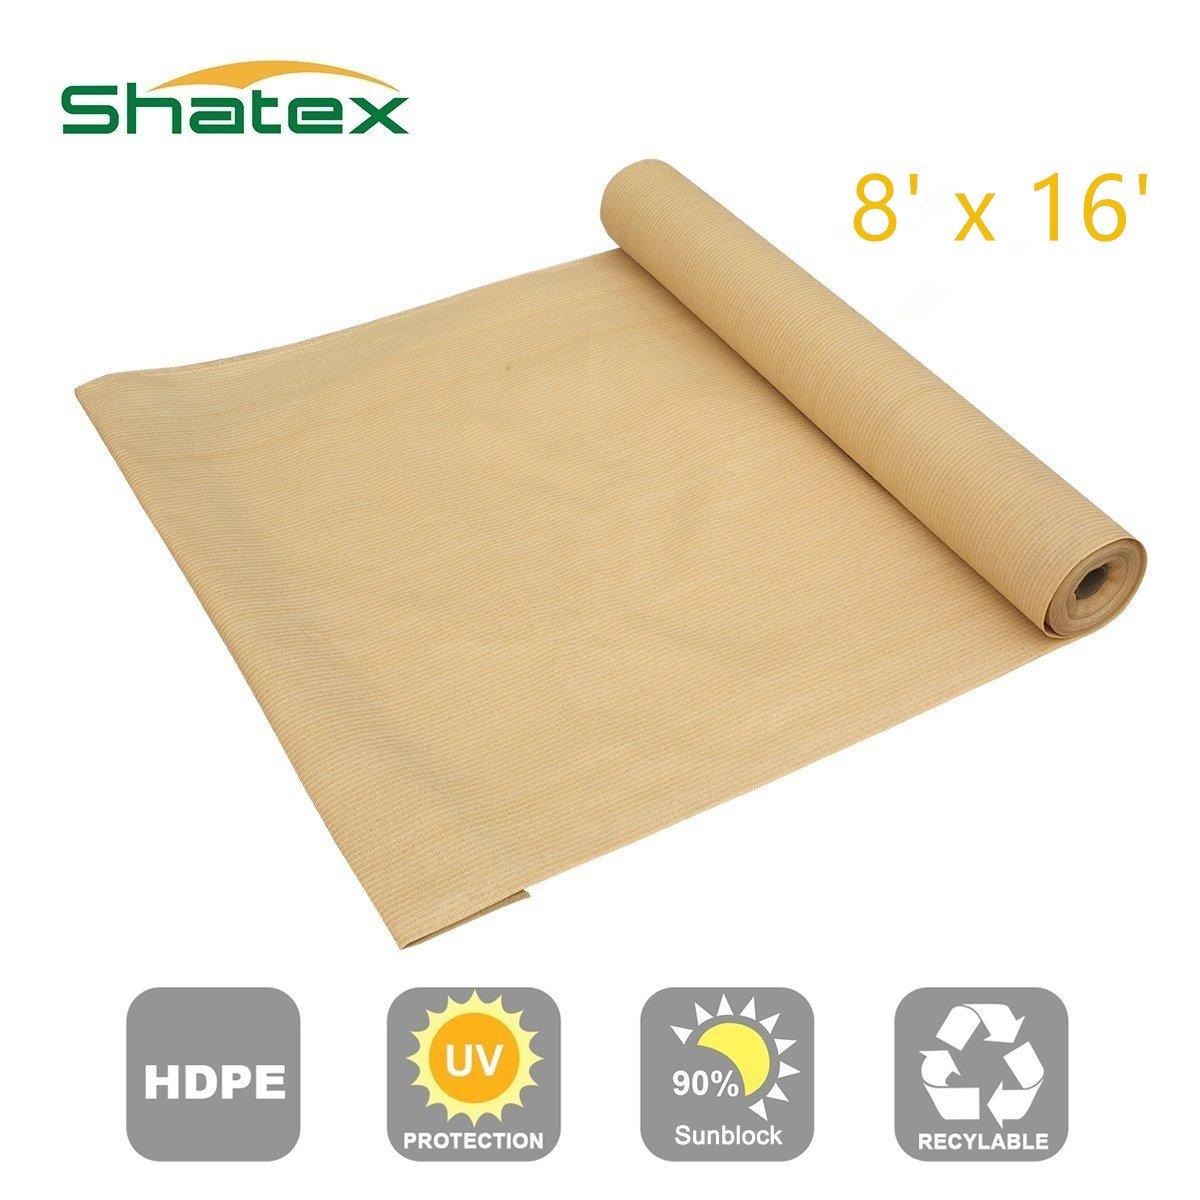 Shatex 90% Sun Shade Fabric for Pergola Cover Porch Vertical Screen 8' x 16', Beige